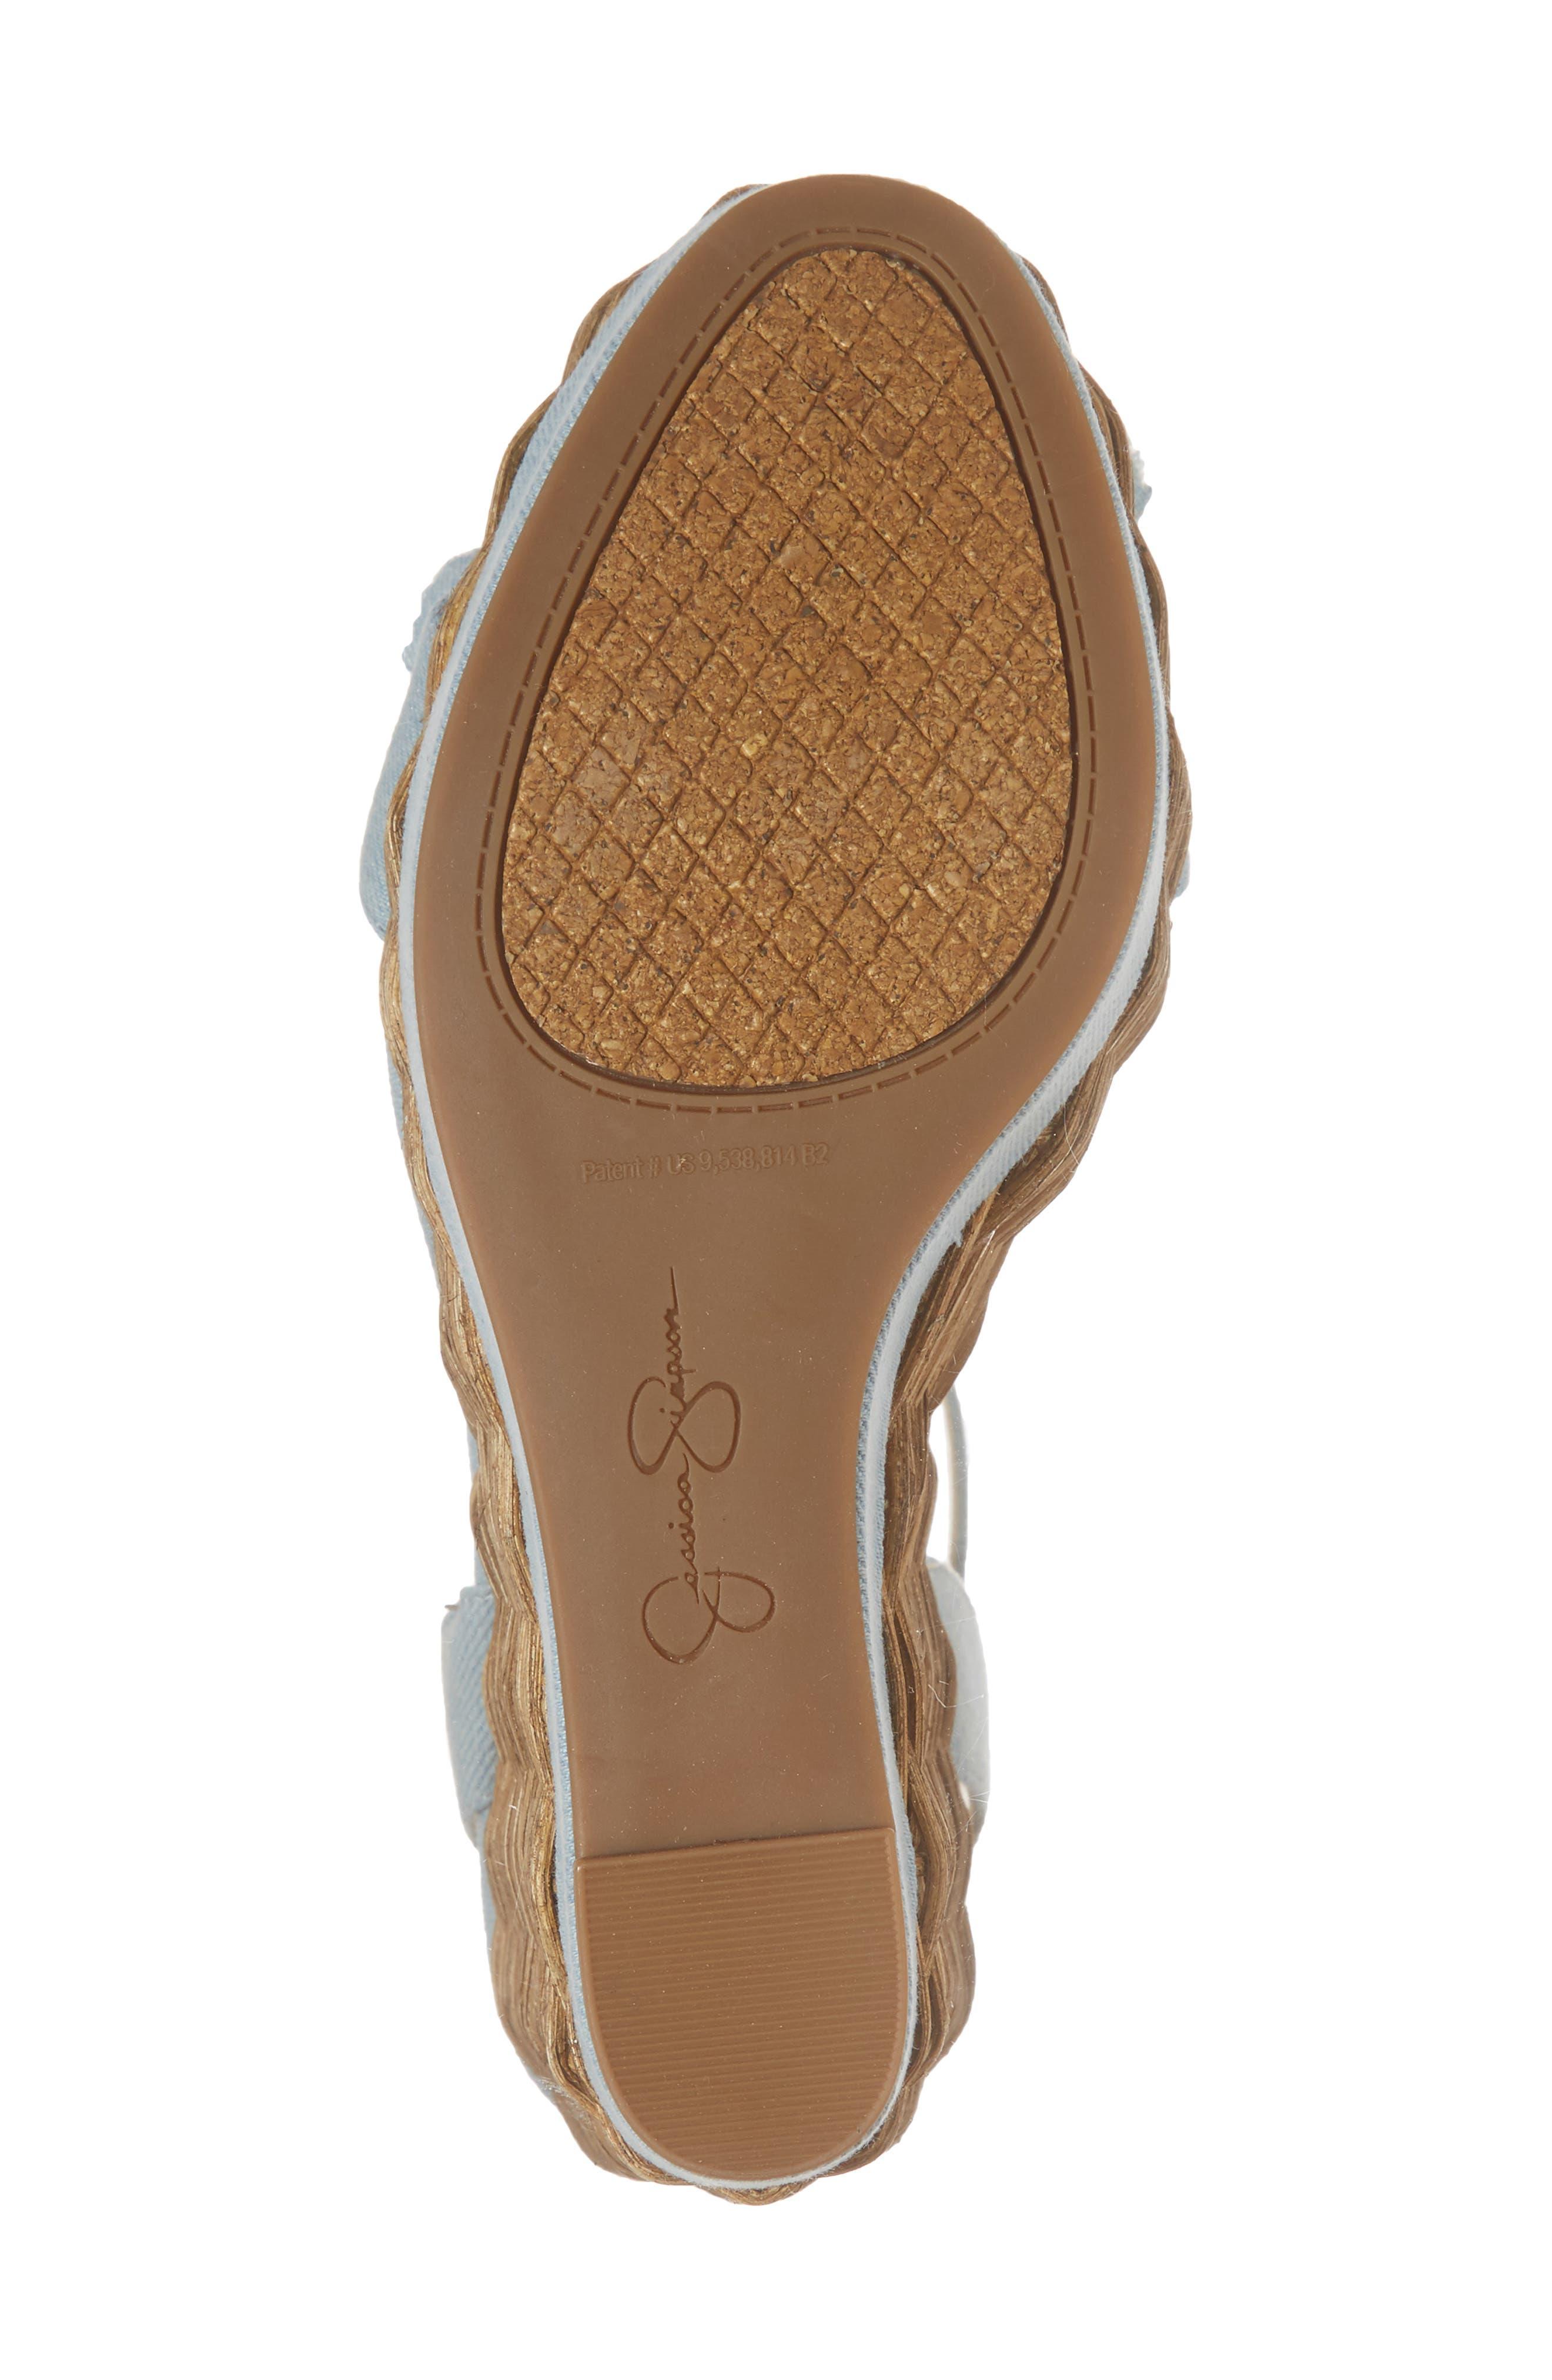 Pressa Platform Wedge Sandal,                             Alternate thumbnail 6, color,                             VINTAGE BLUE